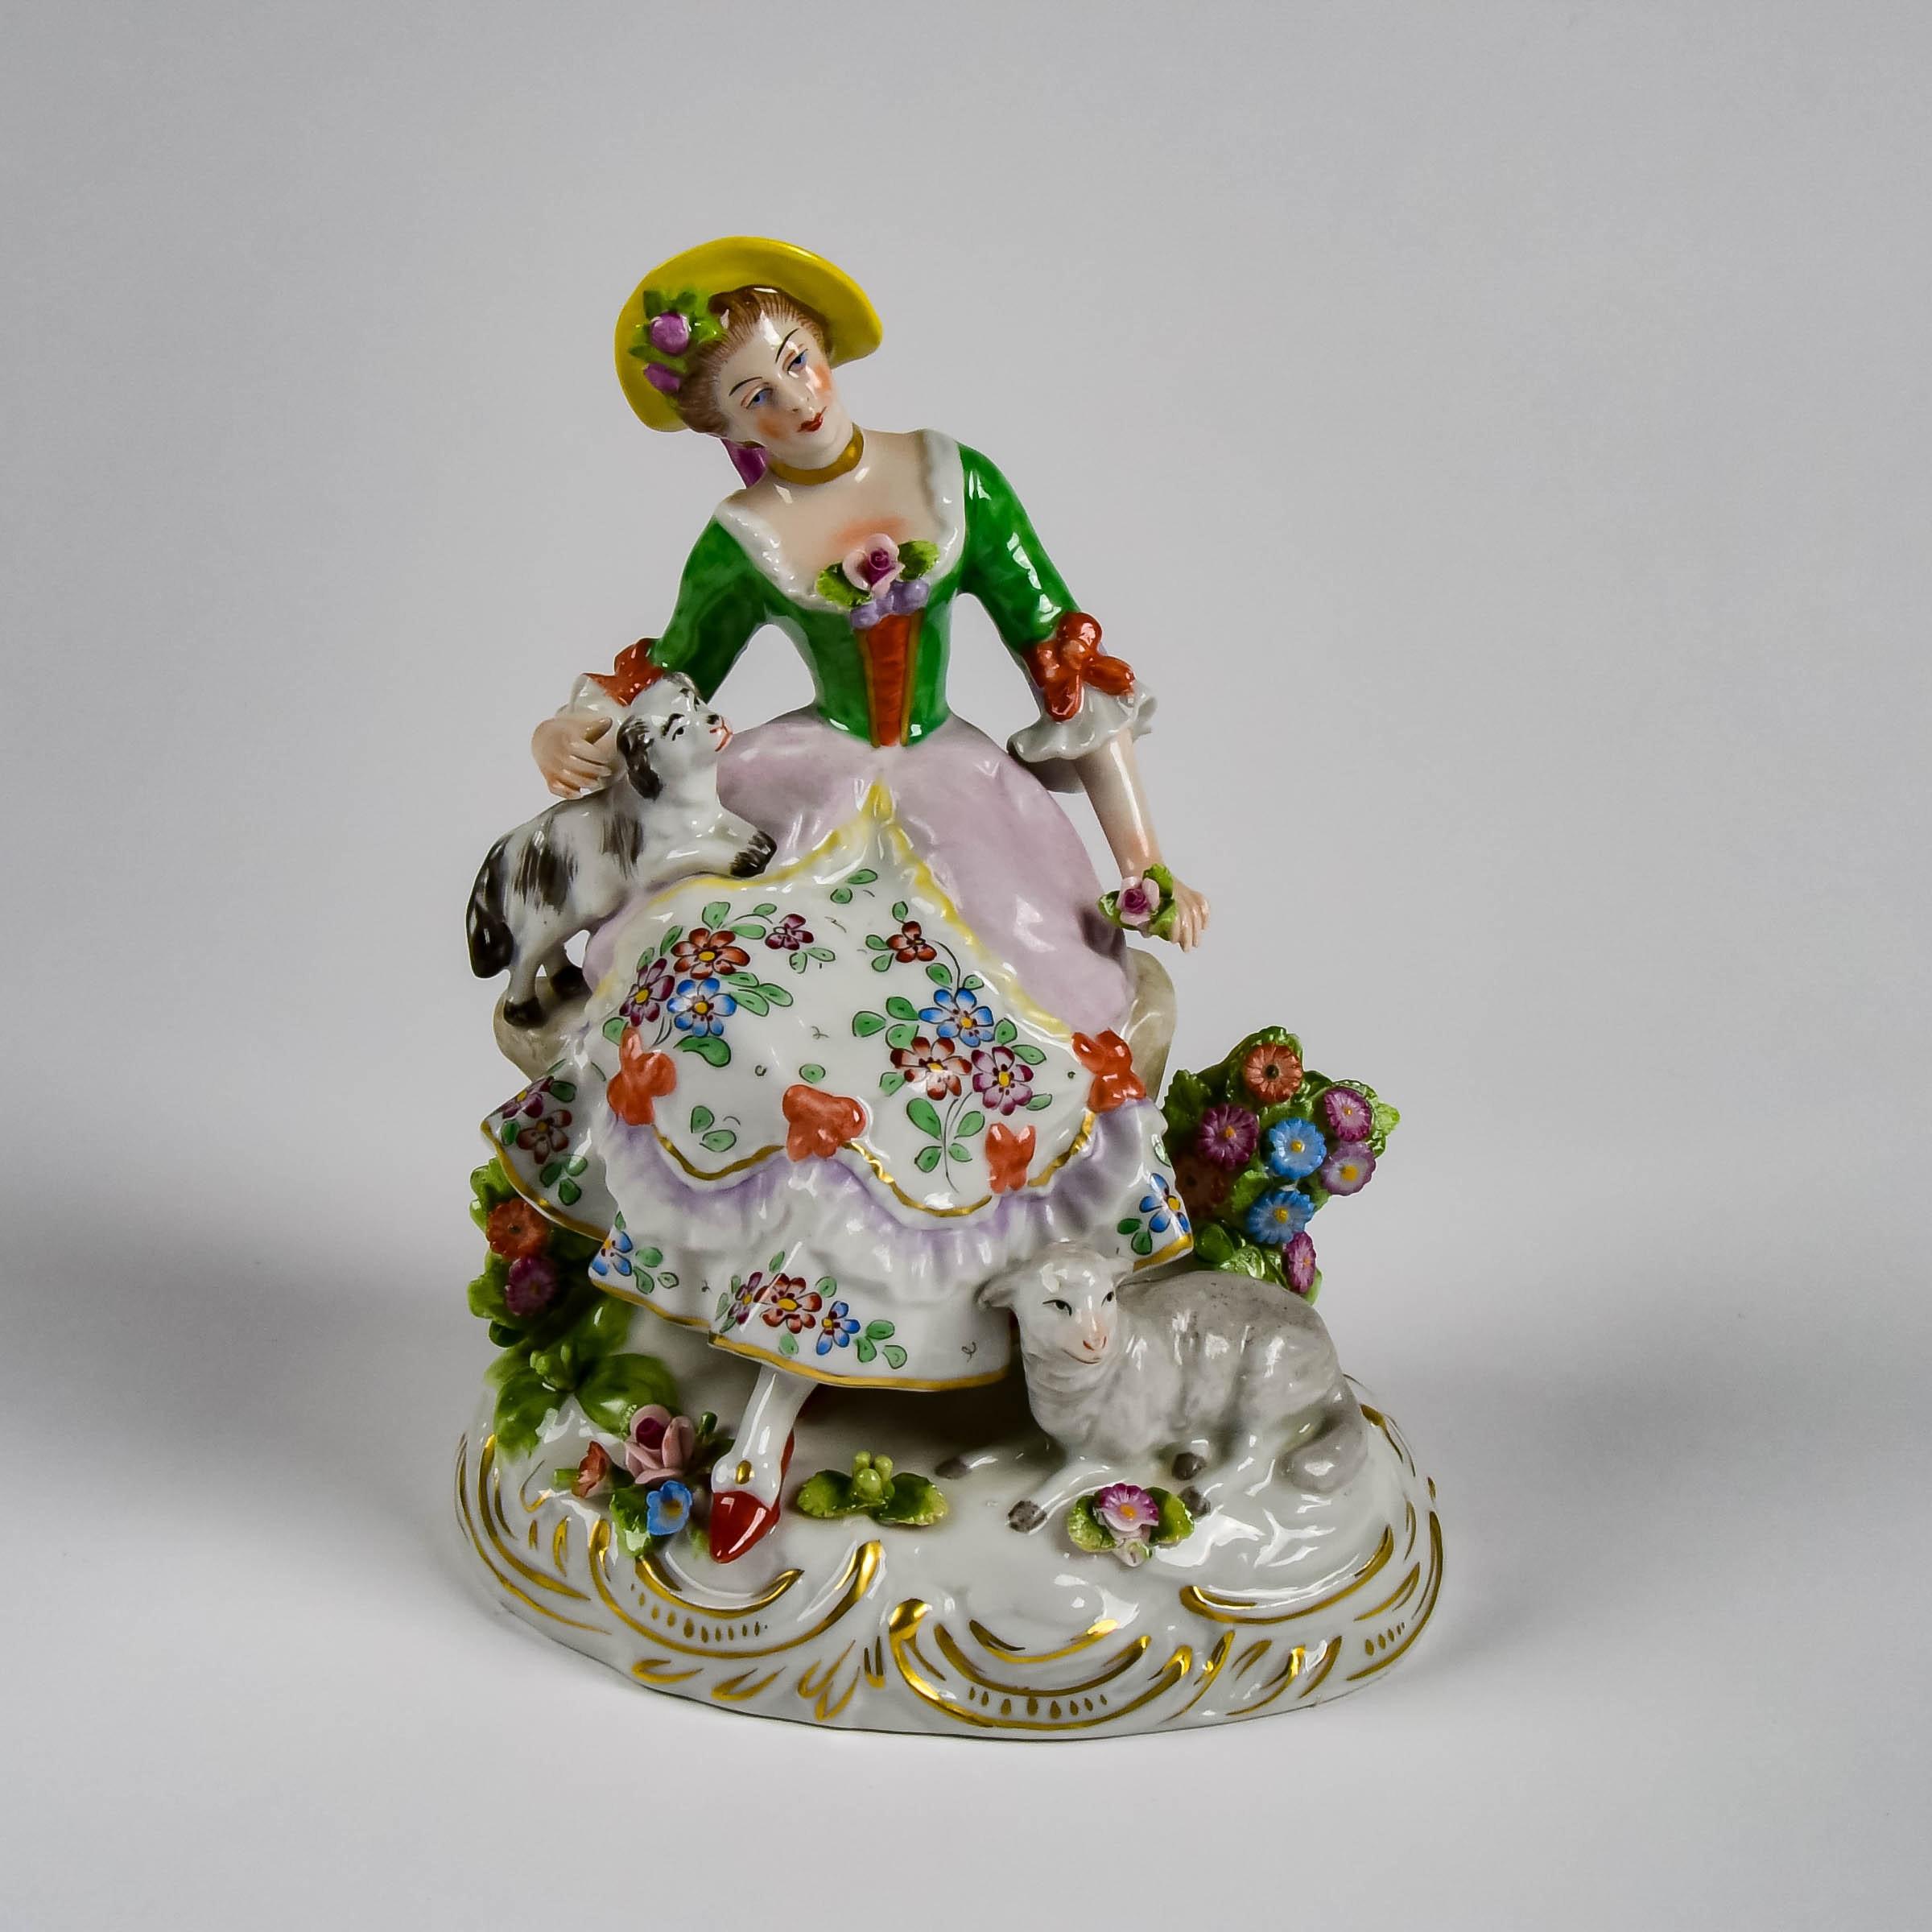 Sitzendorf German Porcelain Figurine